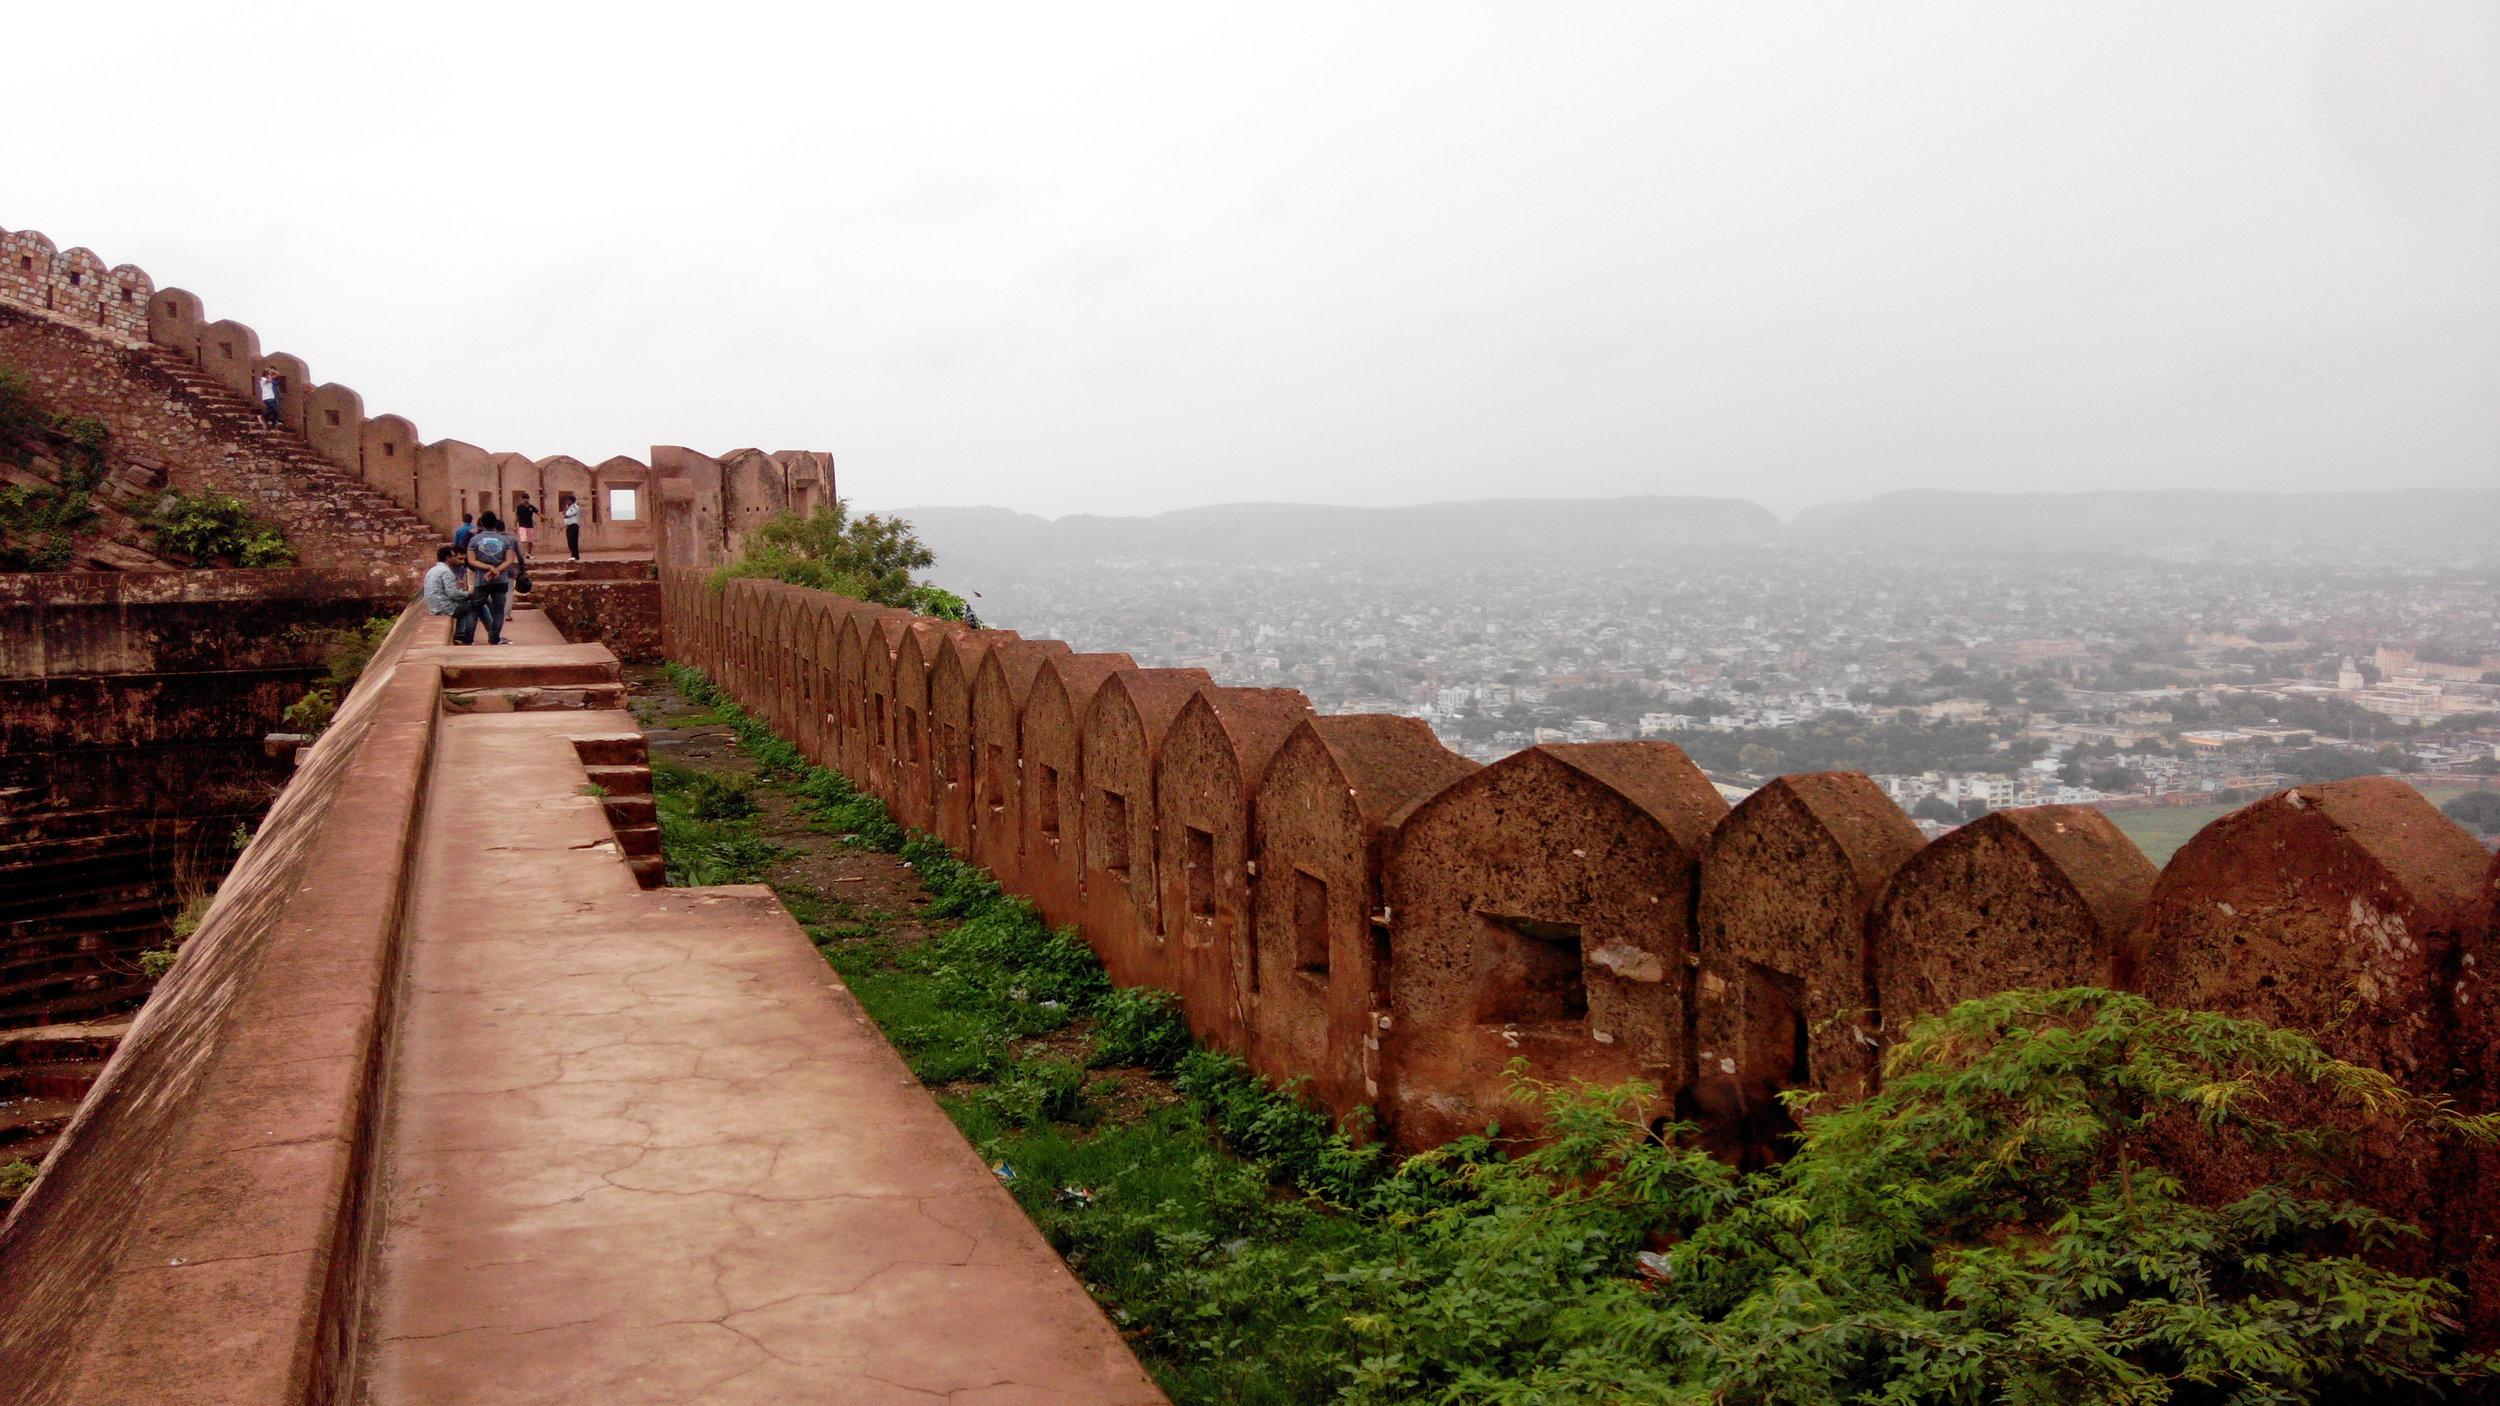 Jaipur-walls-fort-rajasthan.jpg